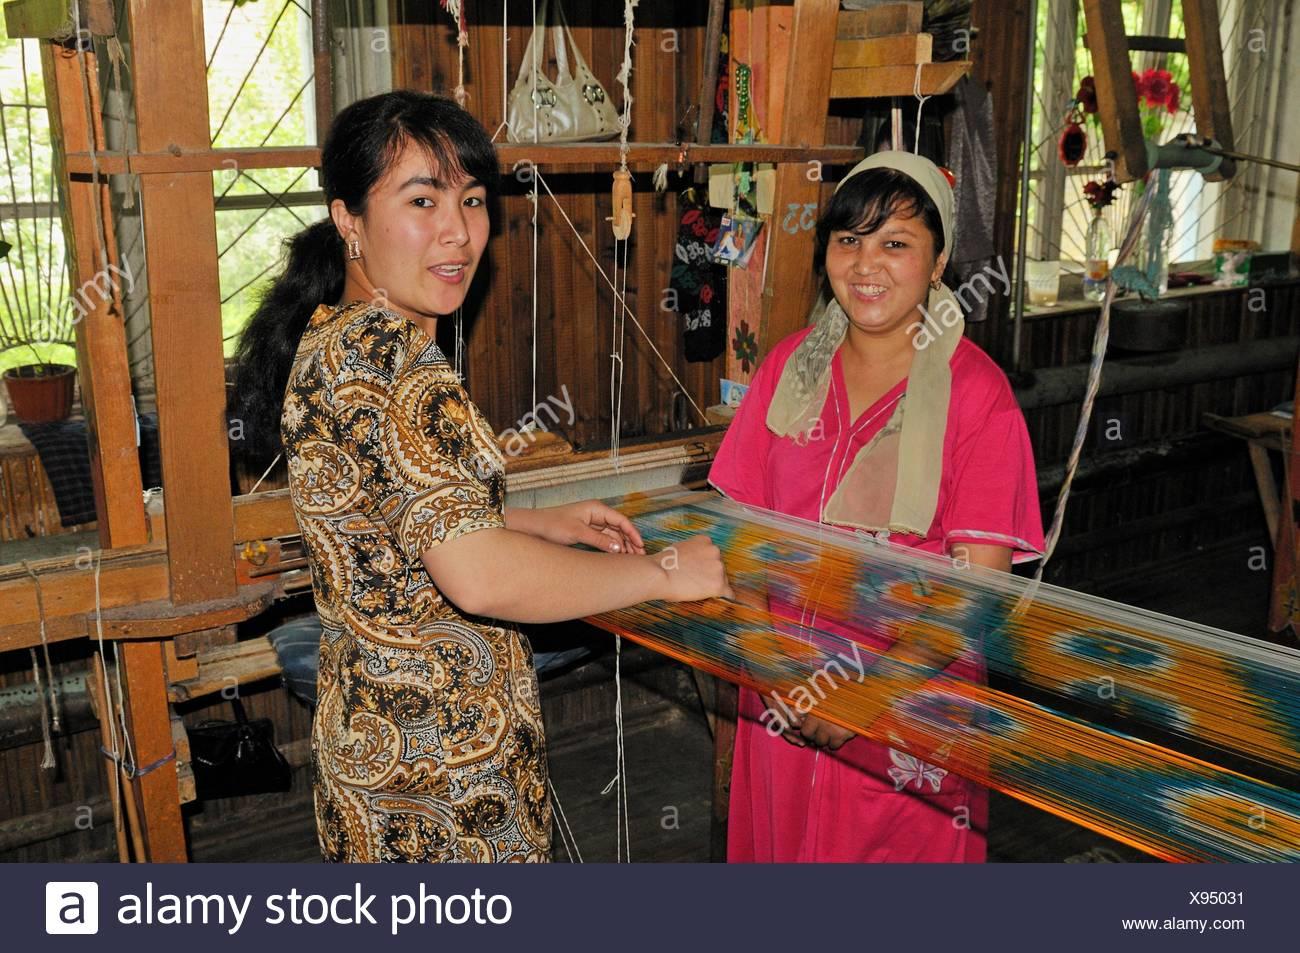 silk production, usbek woman working on a wooden loom, Silk Road, Fergana Valley, Uzbekistan, Central Asia Stock Photo